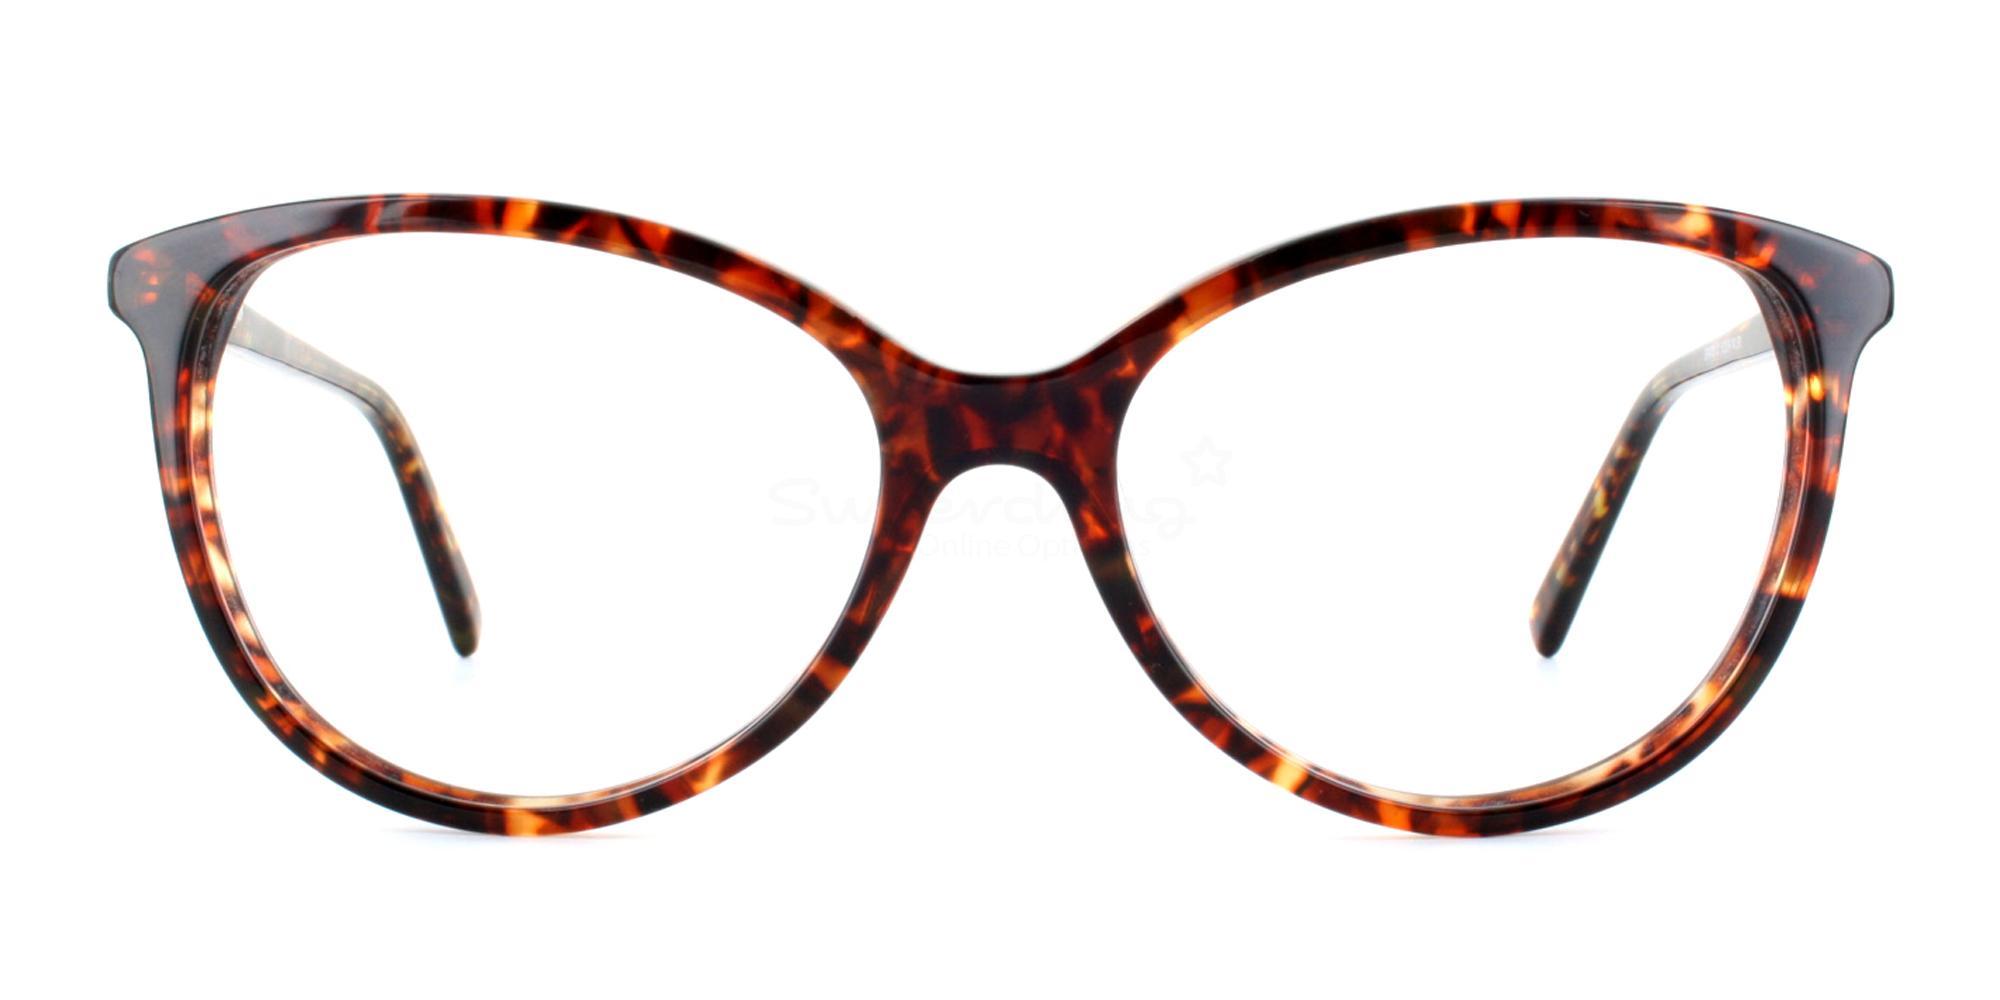 C1 SRA129 Glasses, Neon